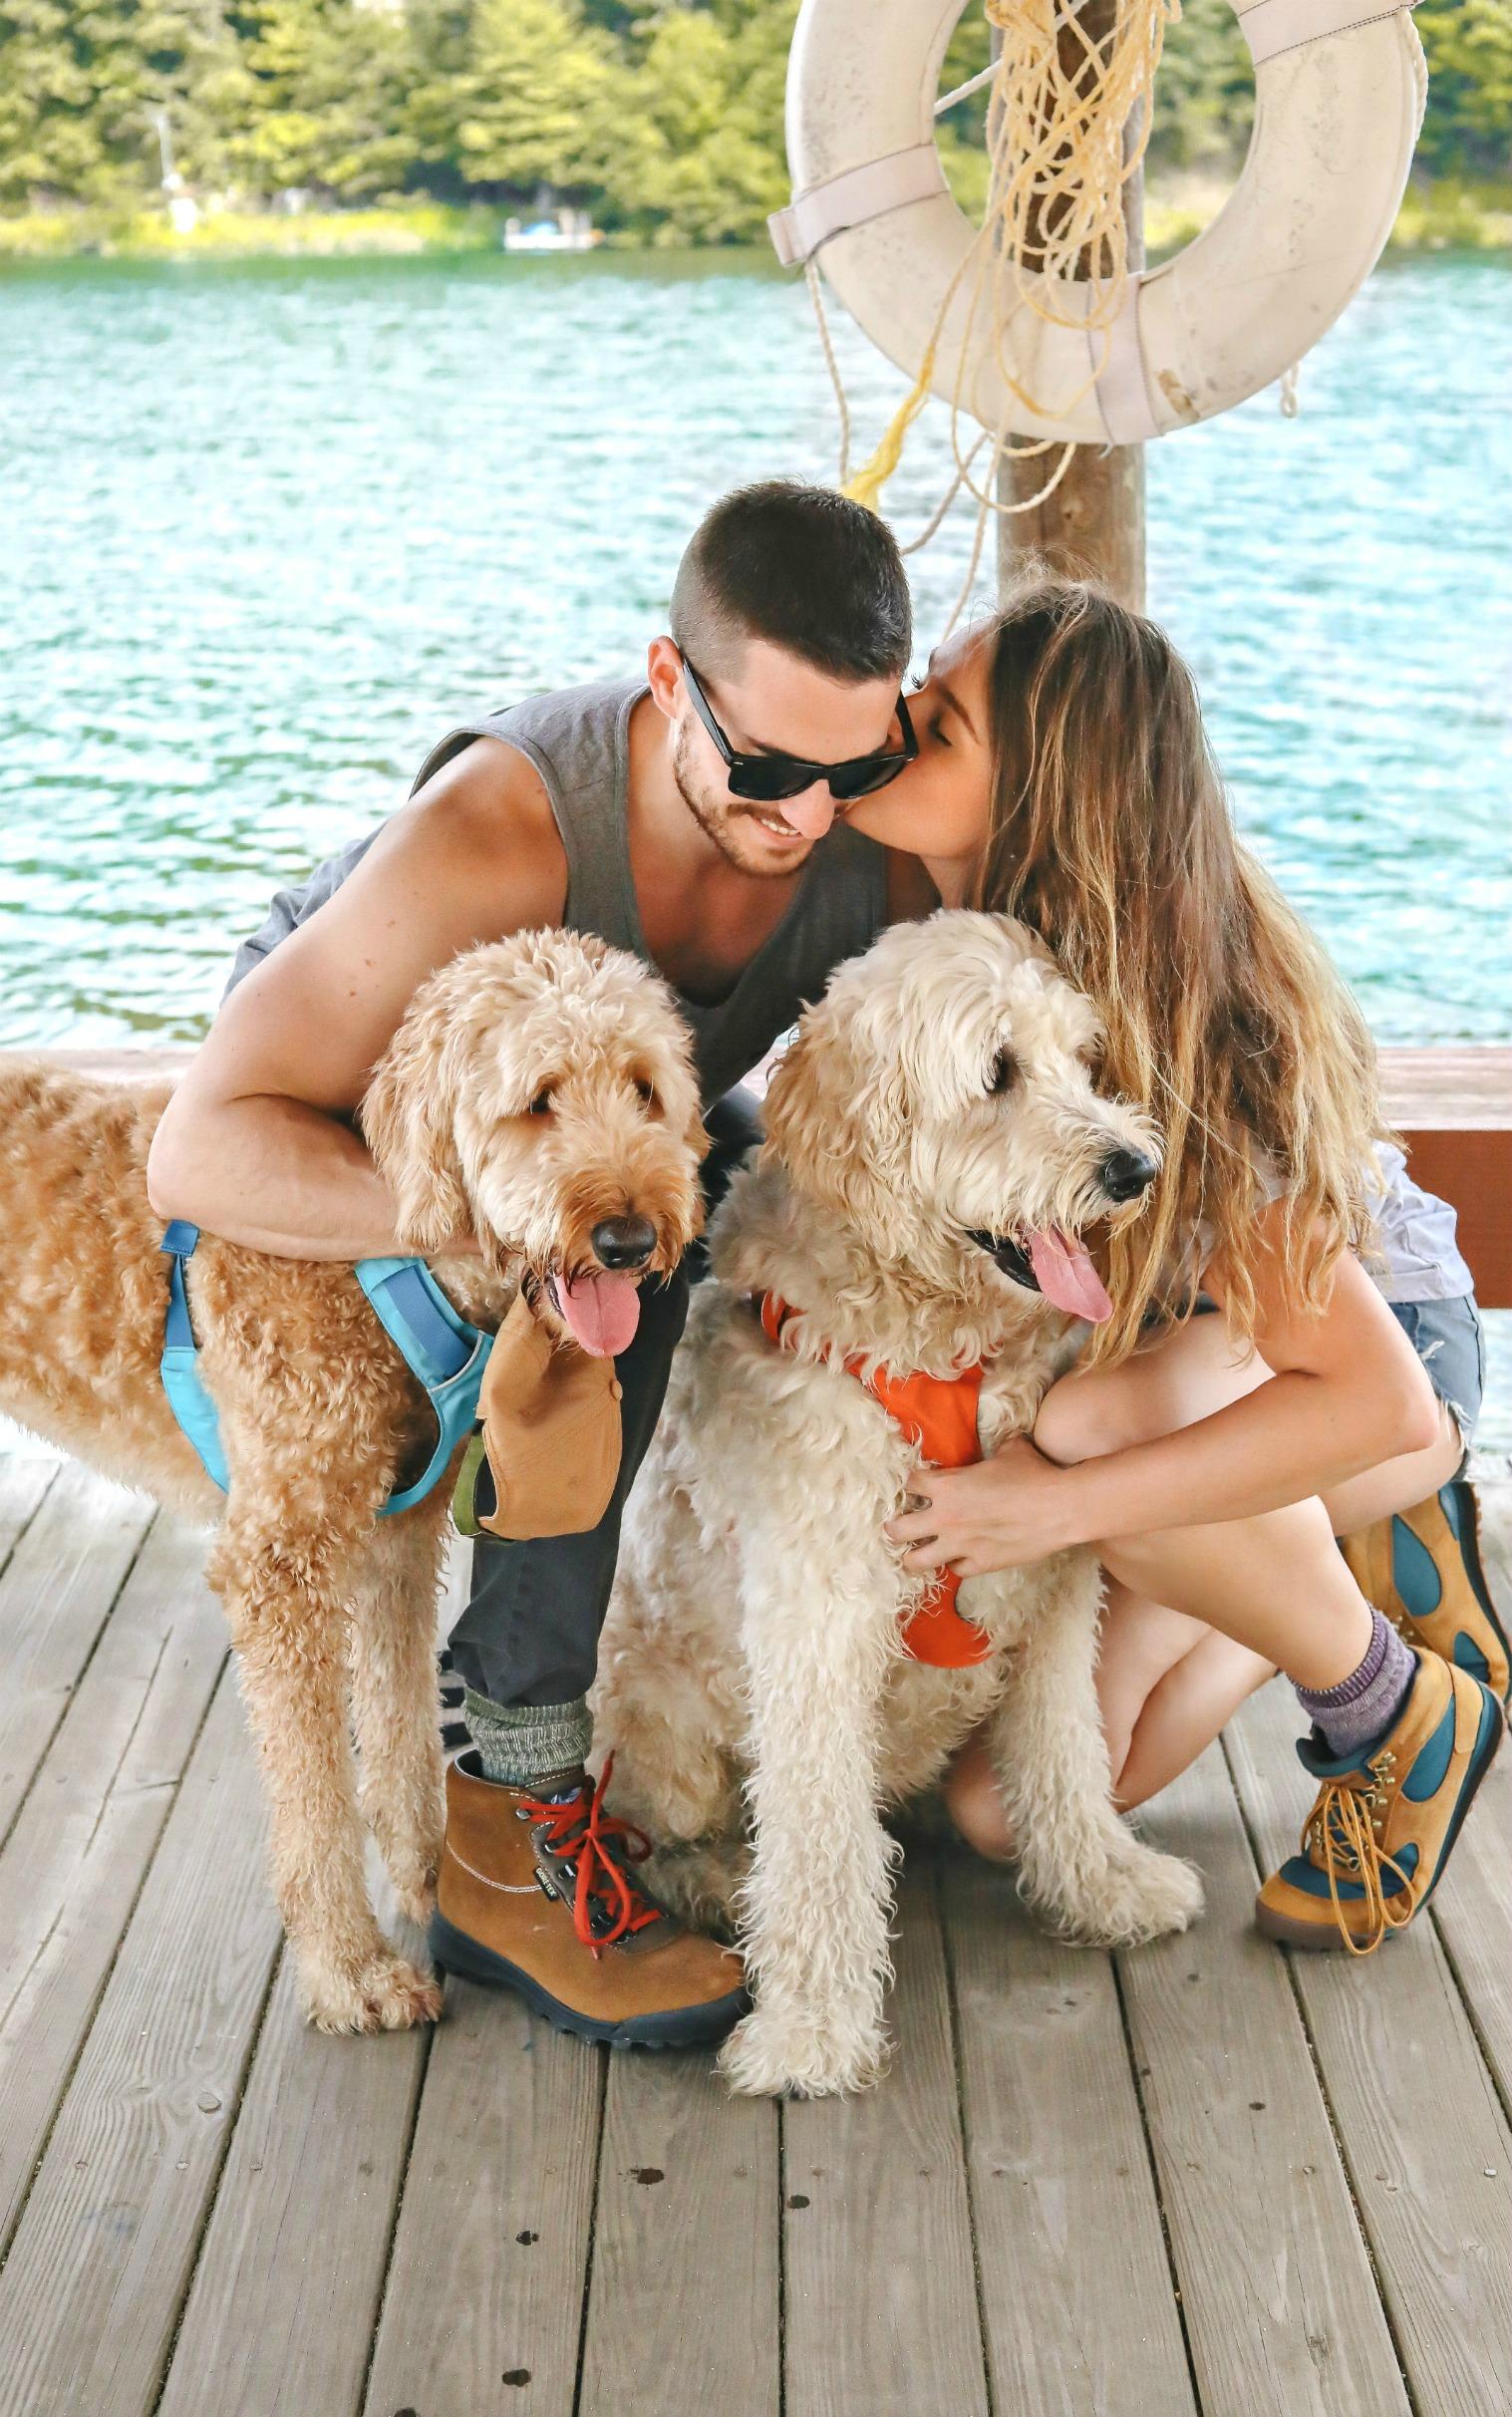 couples hiking, dogs, ruffwear, lake, mountain trip, hike, camp, fishing, Patagonia, back country, hiking boots